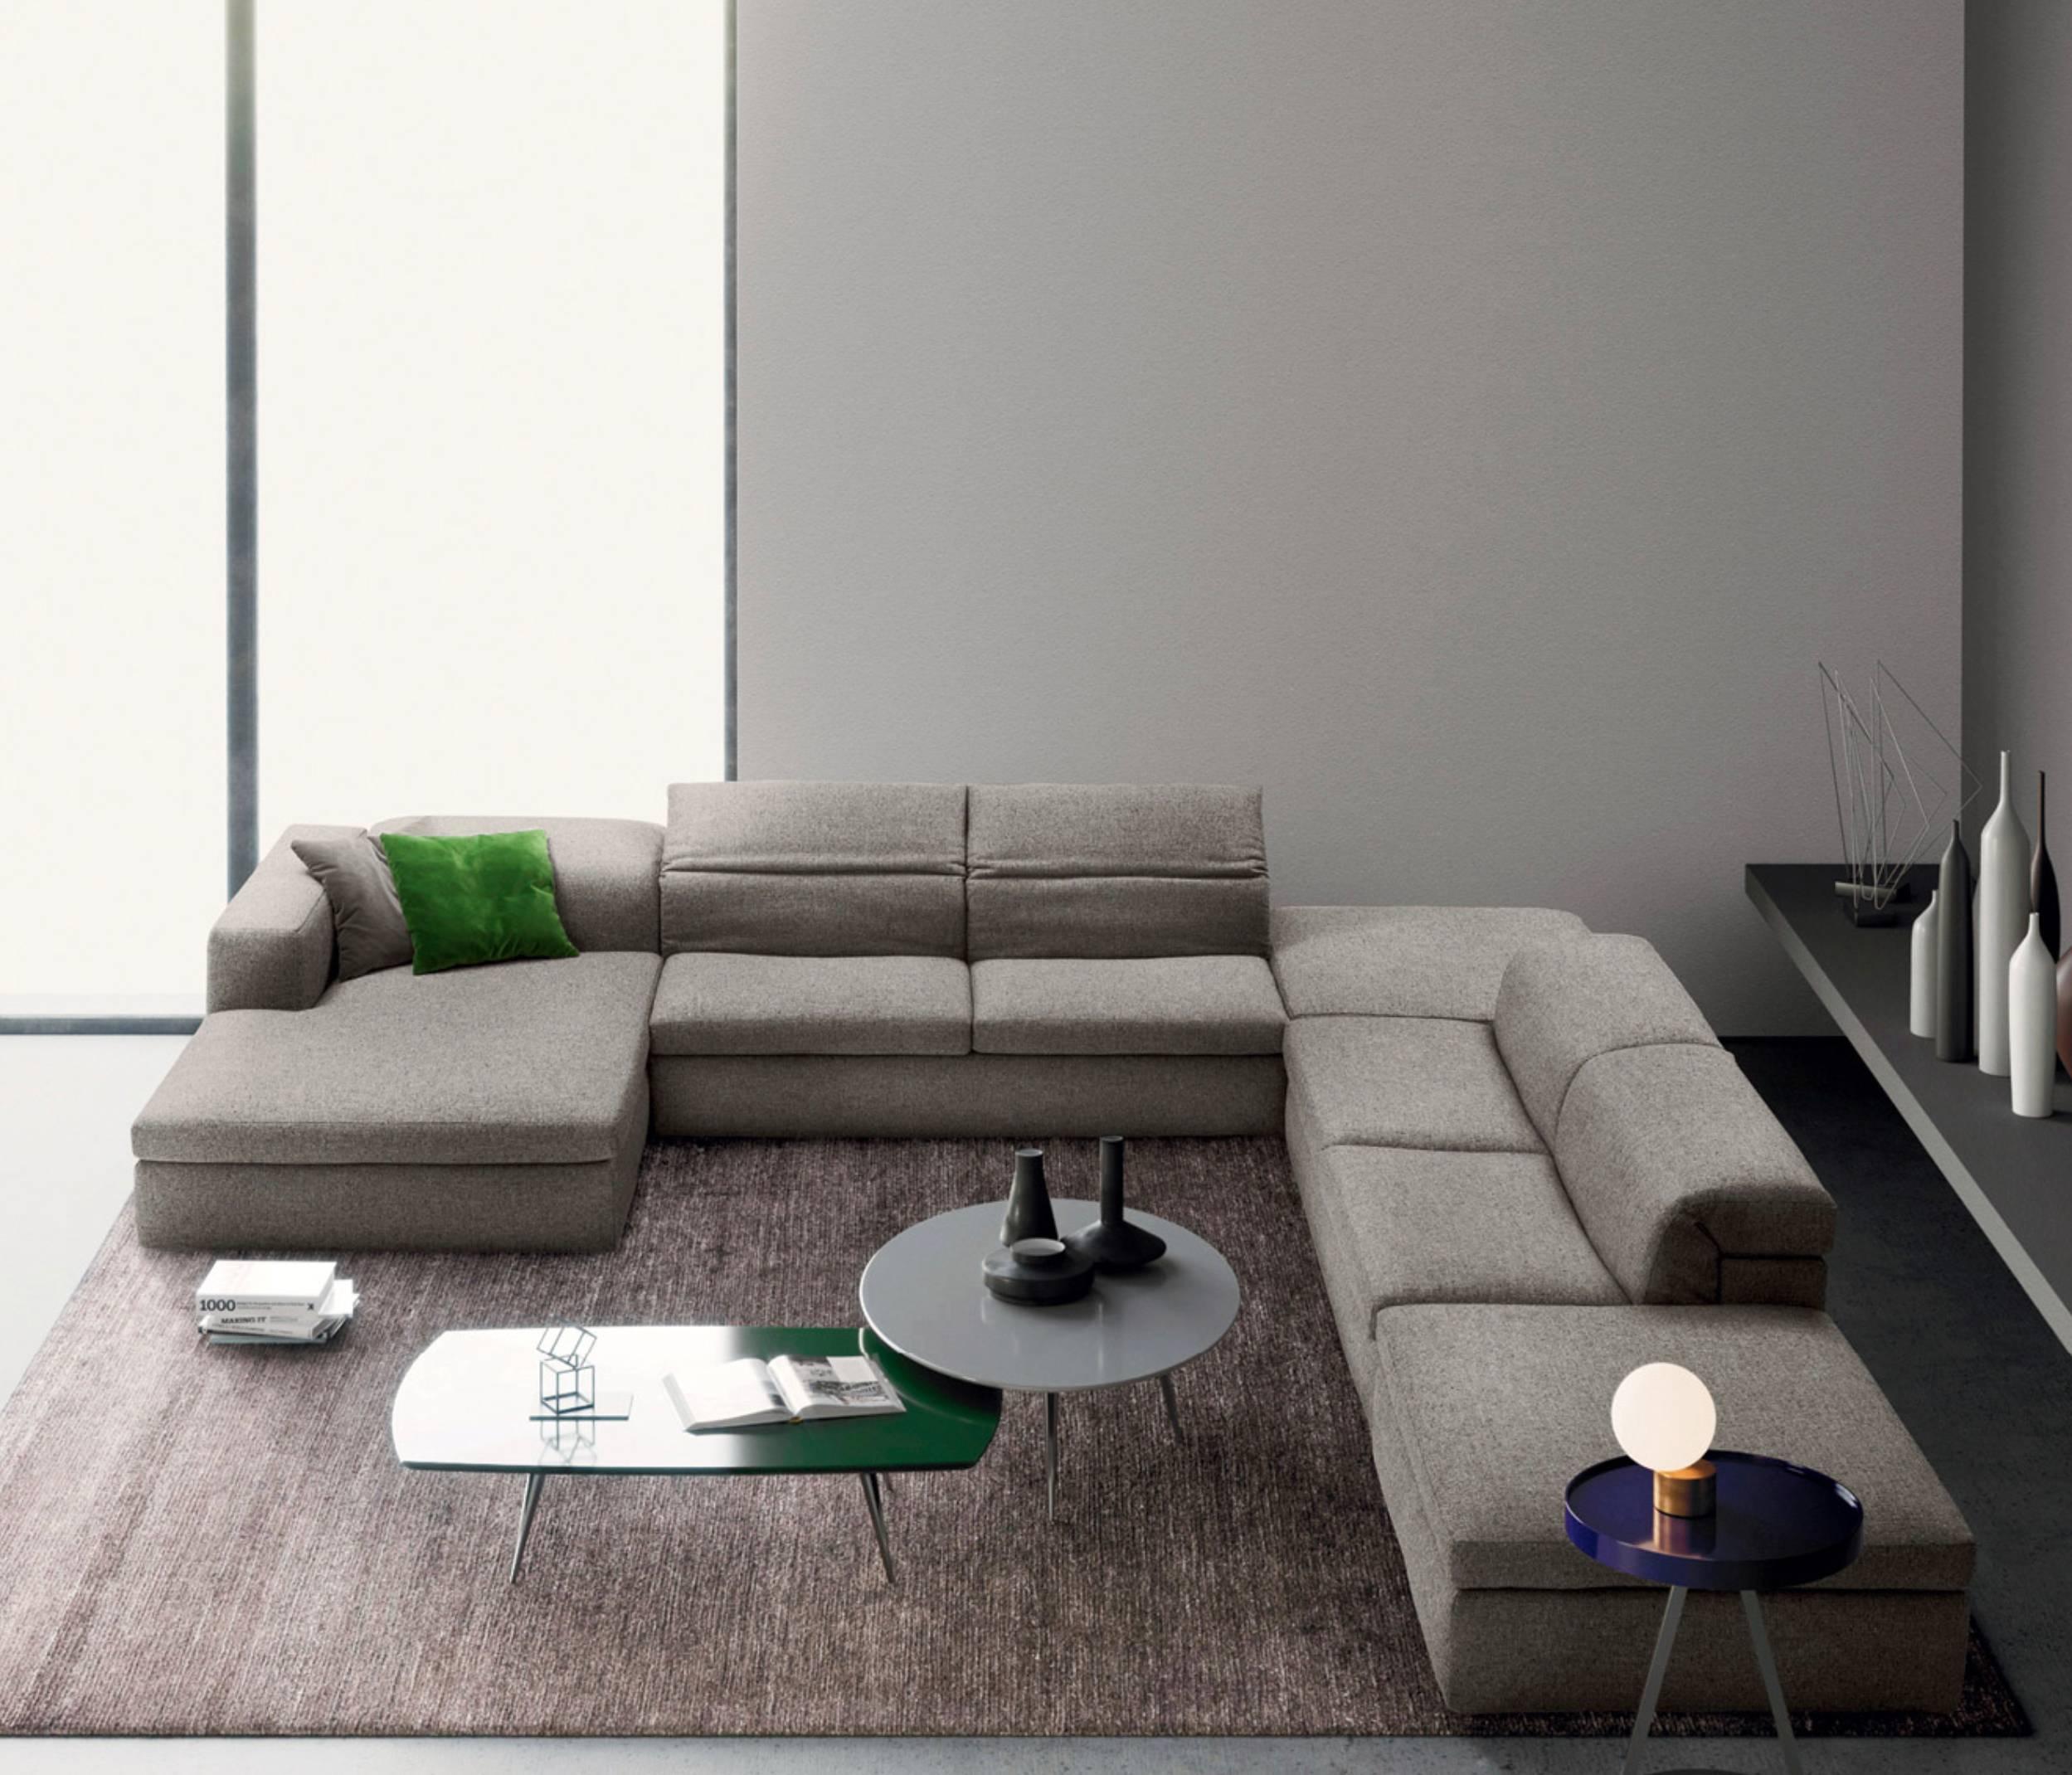 A973 Premium Leather Sofa Set in White